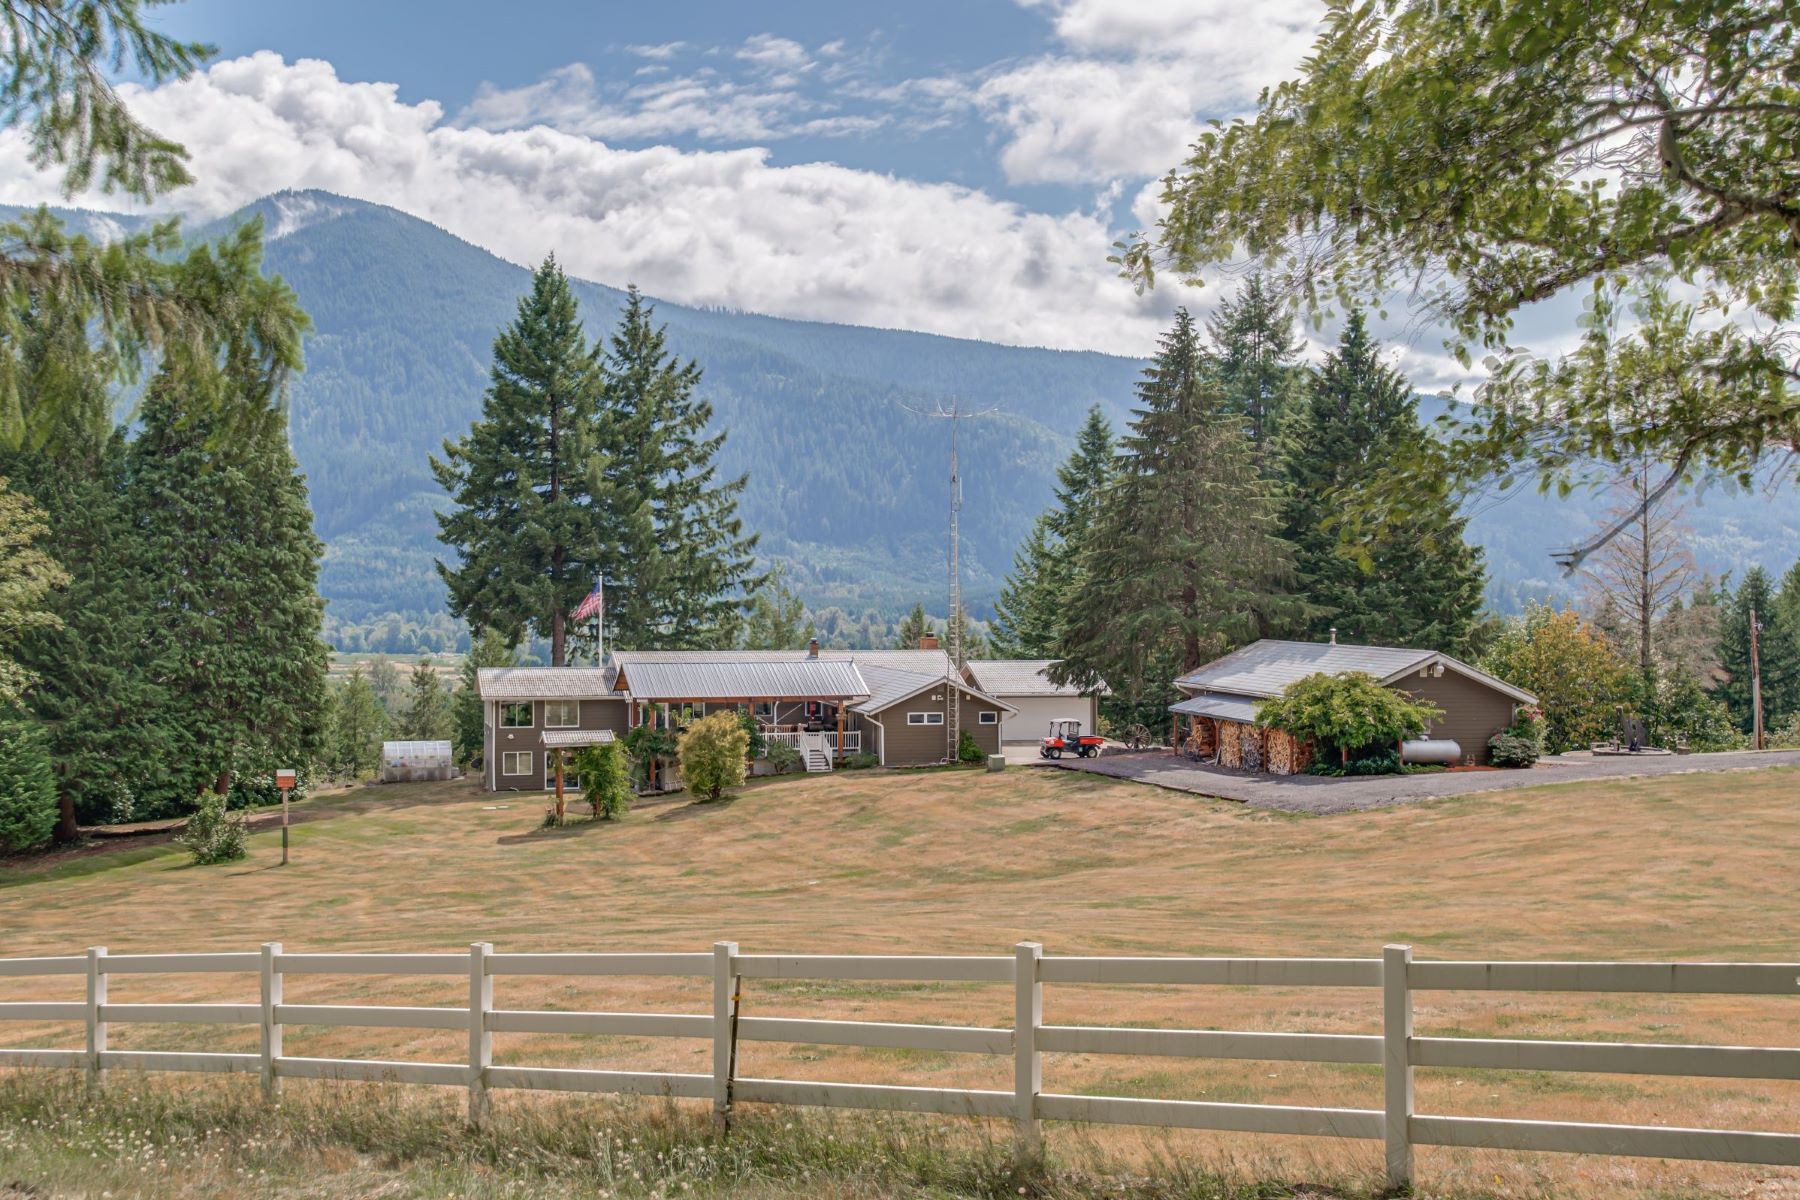 Other Residential Homes 용 매매 에 321 DAVIS CREEK RD Randle, WA 98377 Randle, 워싱톤 98377 미국